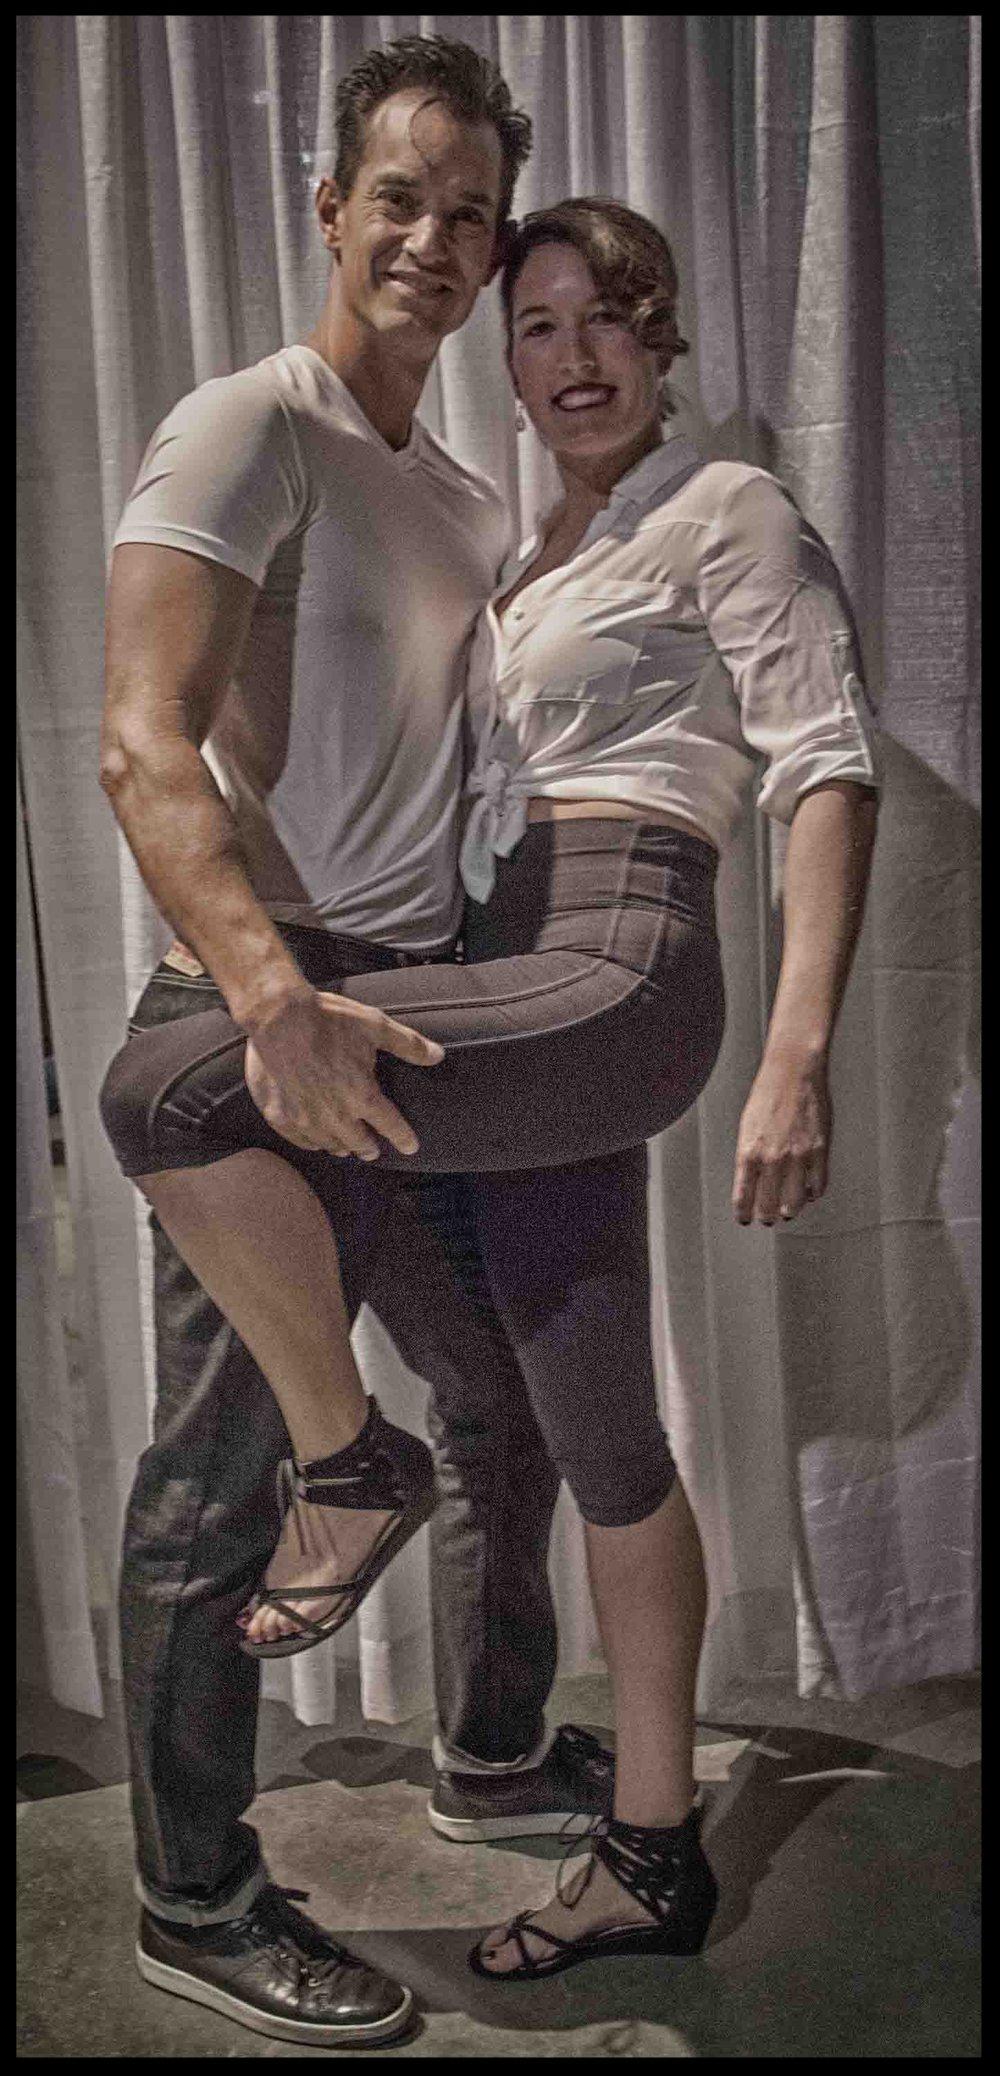 couple4.jpg